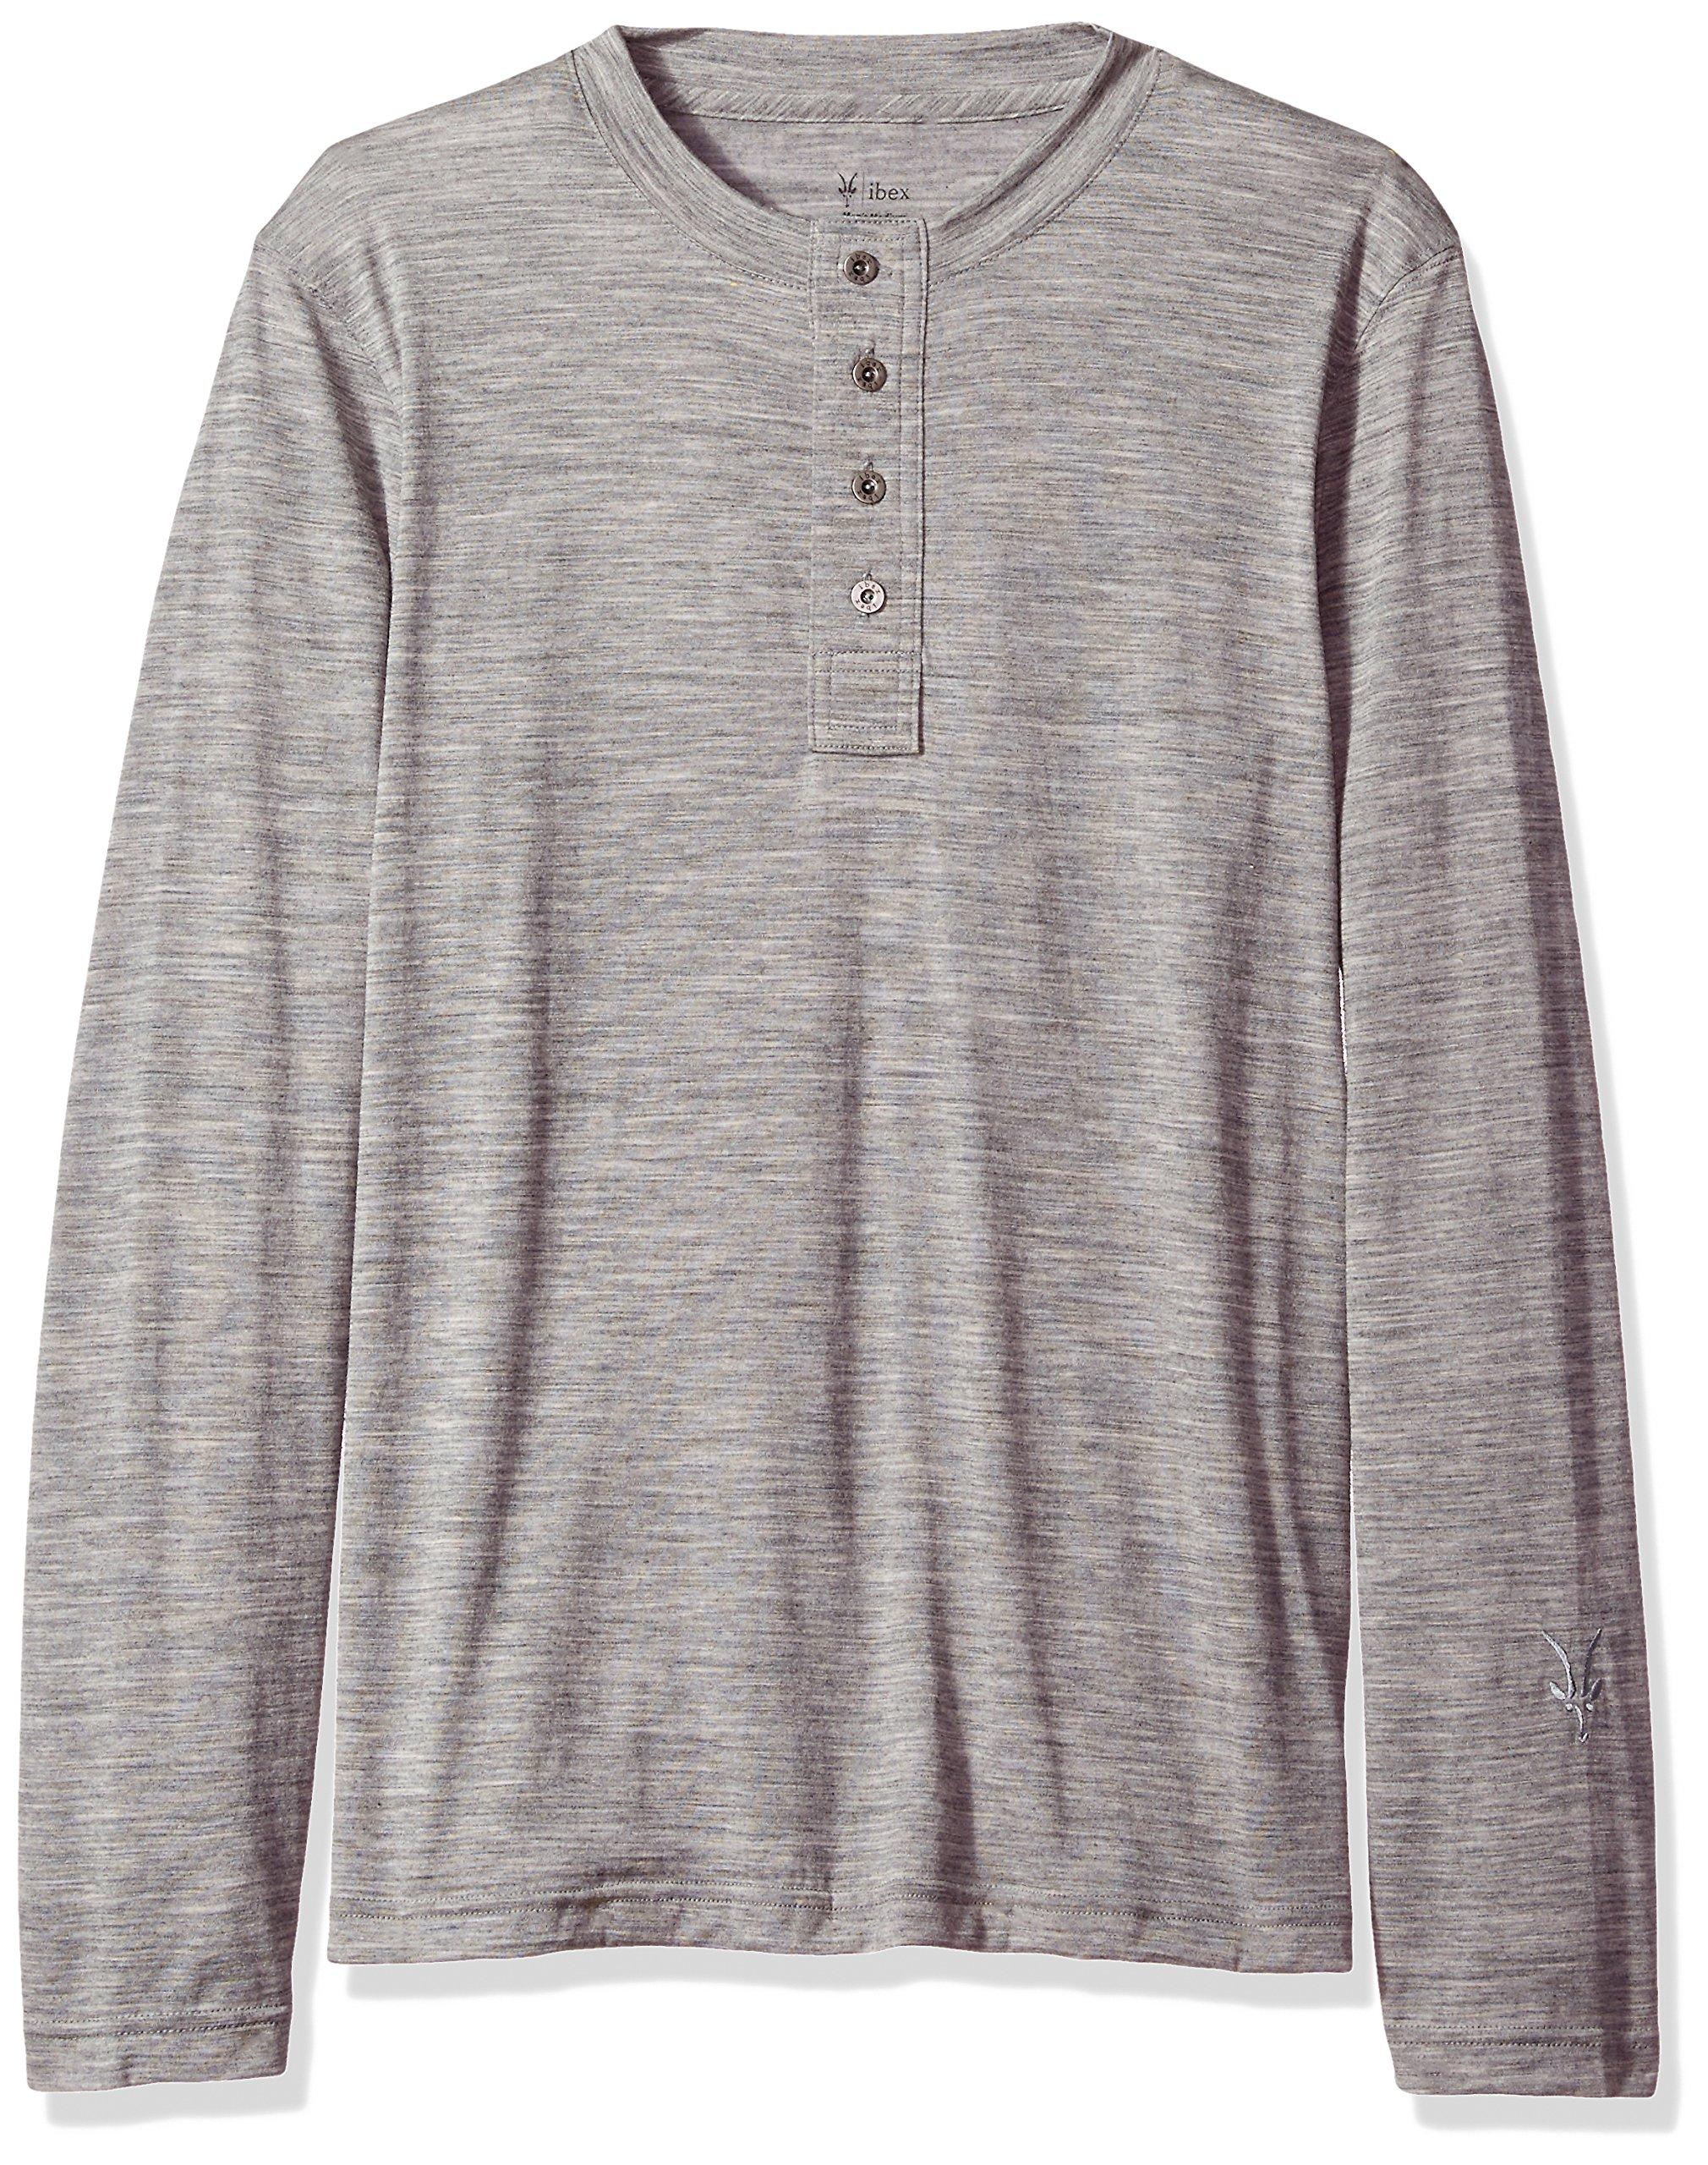 Ibex outdoor Clothing Merino Wool Odyssey Henley, Stone Grey Heather, XX-Large